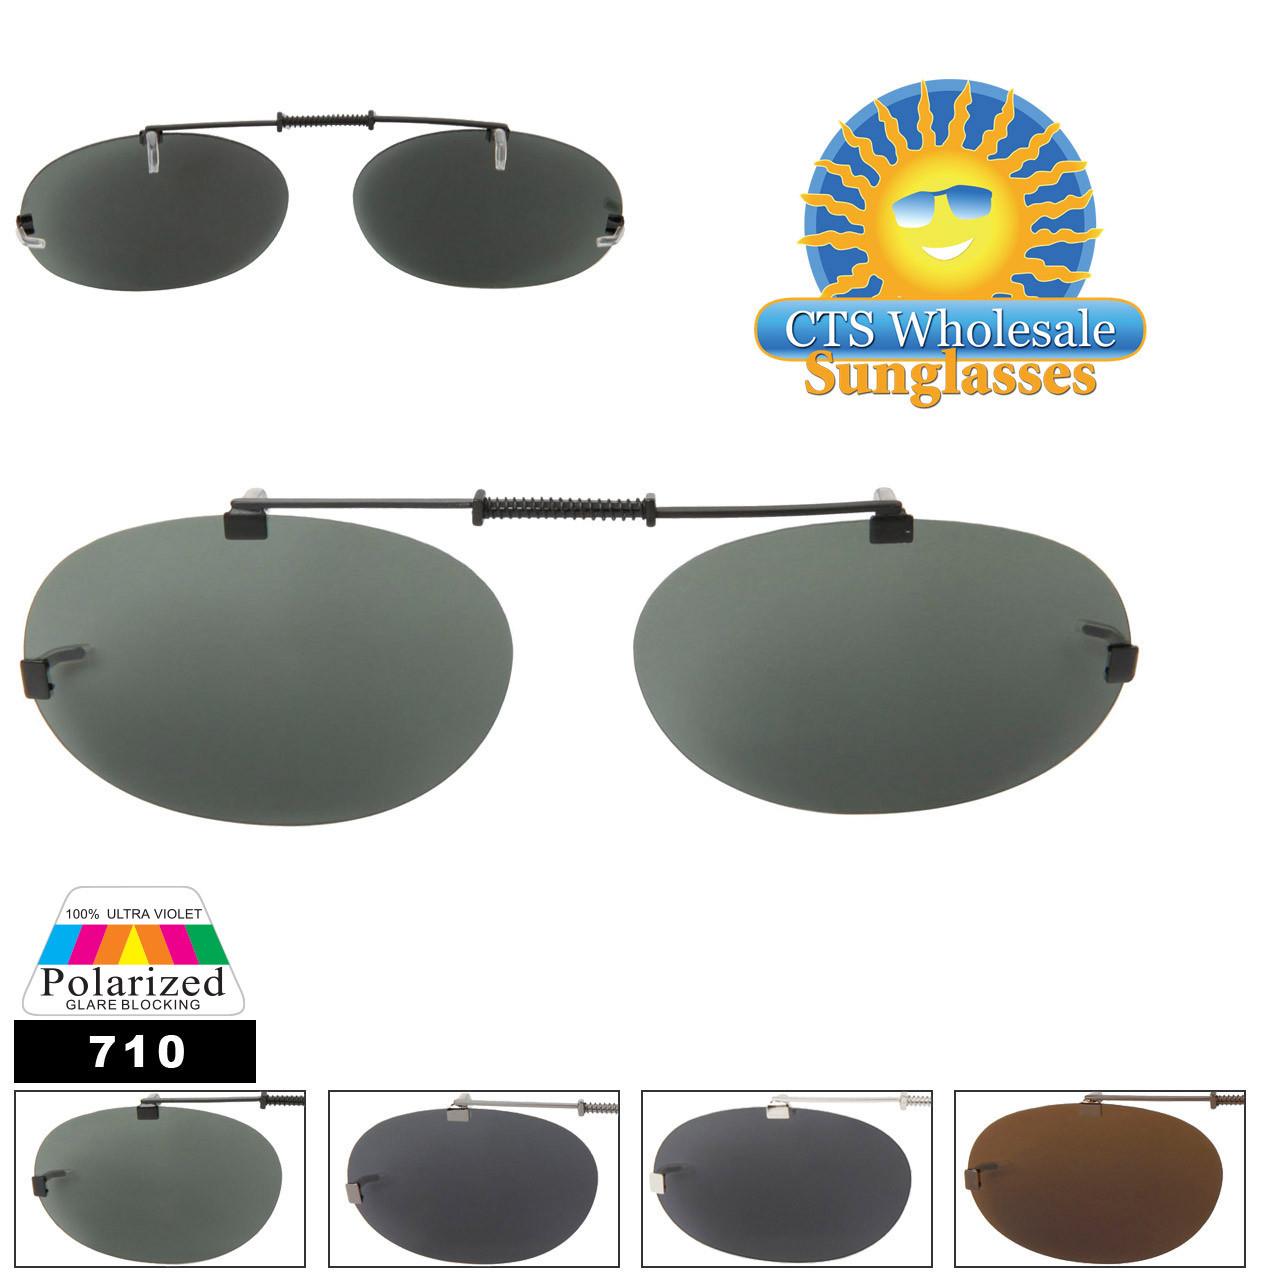 #710 Polarized Clip On Sunglasses